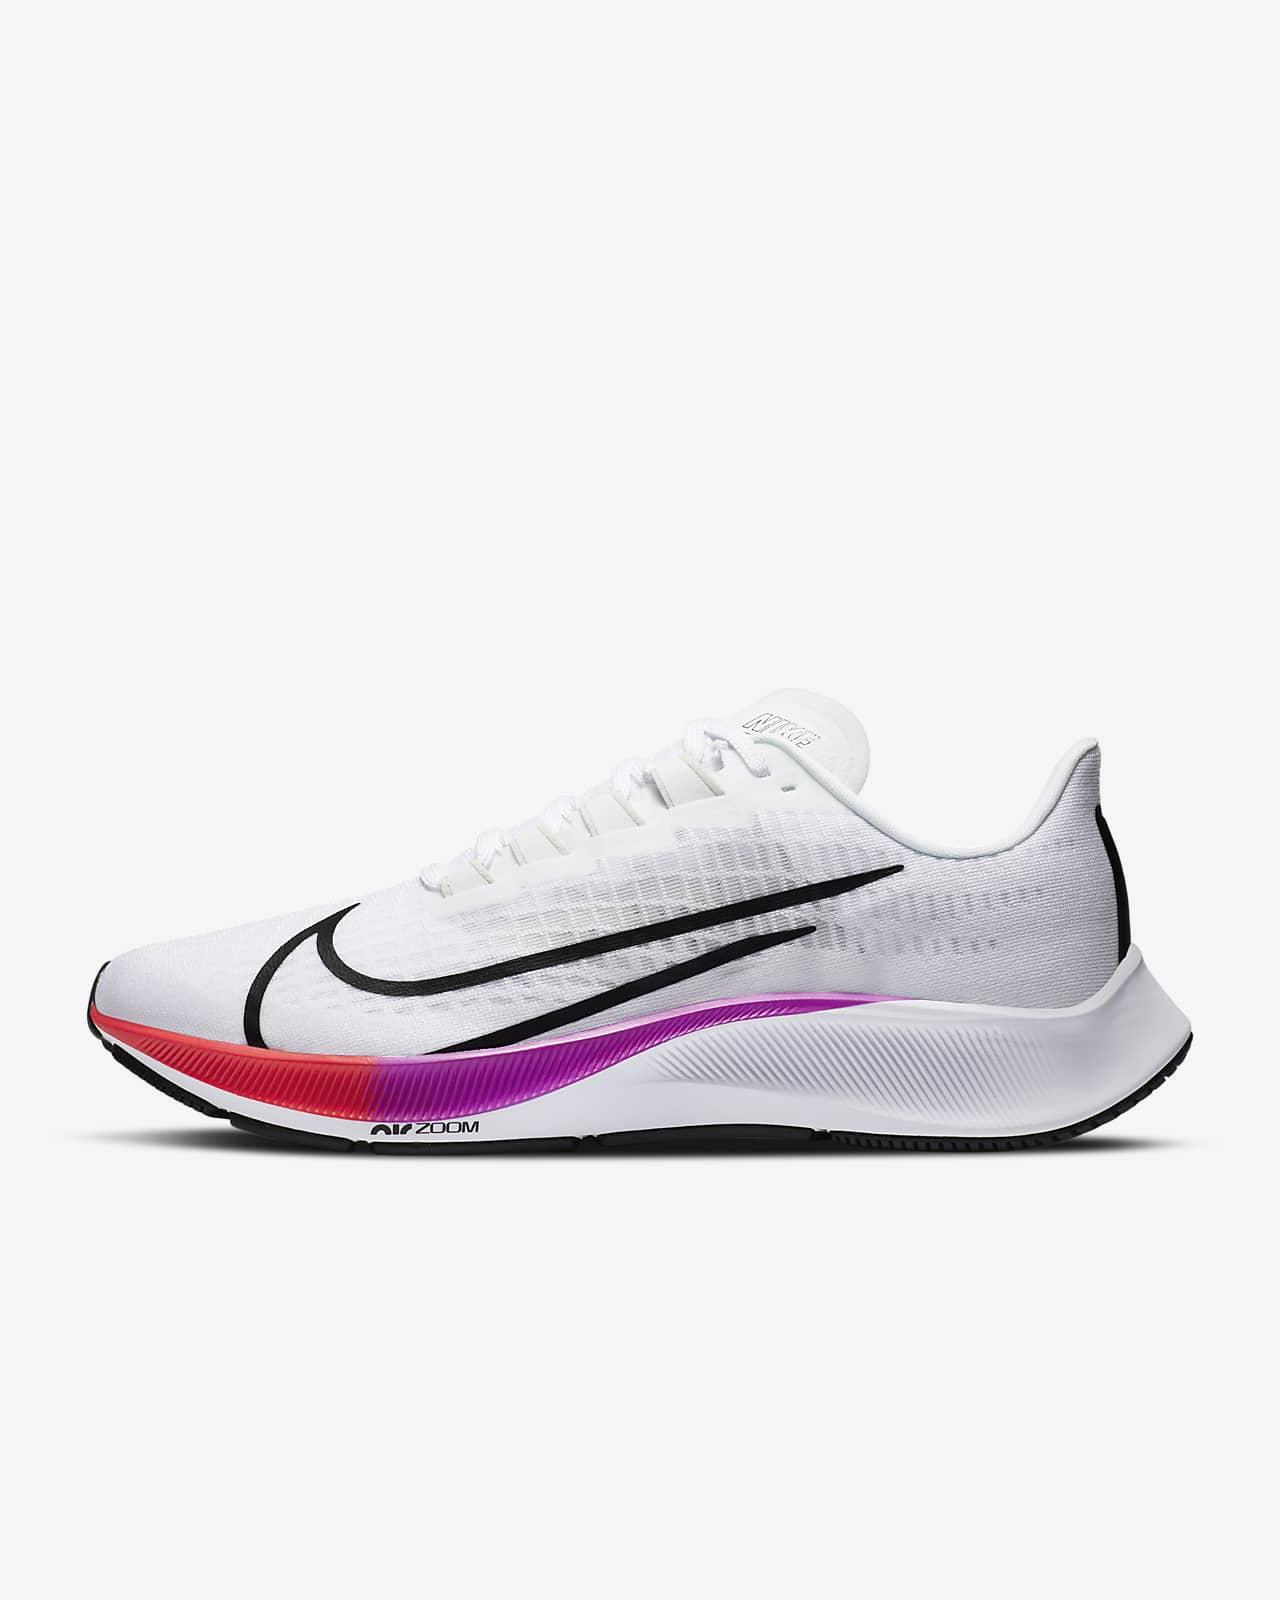 nike hombre zapatillas running blancas